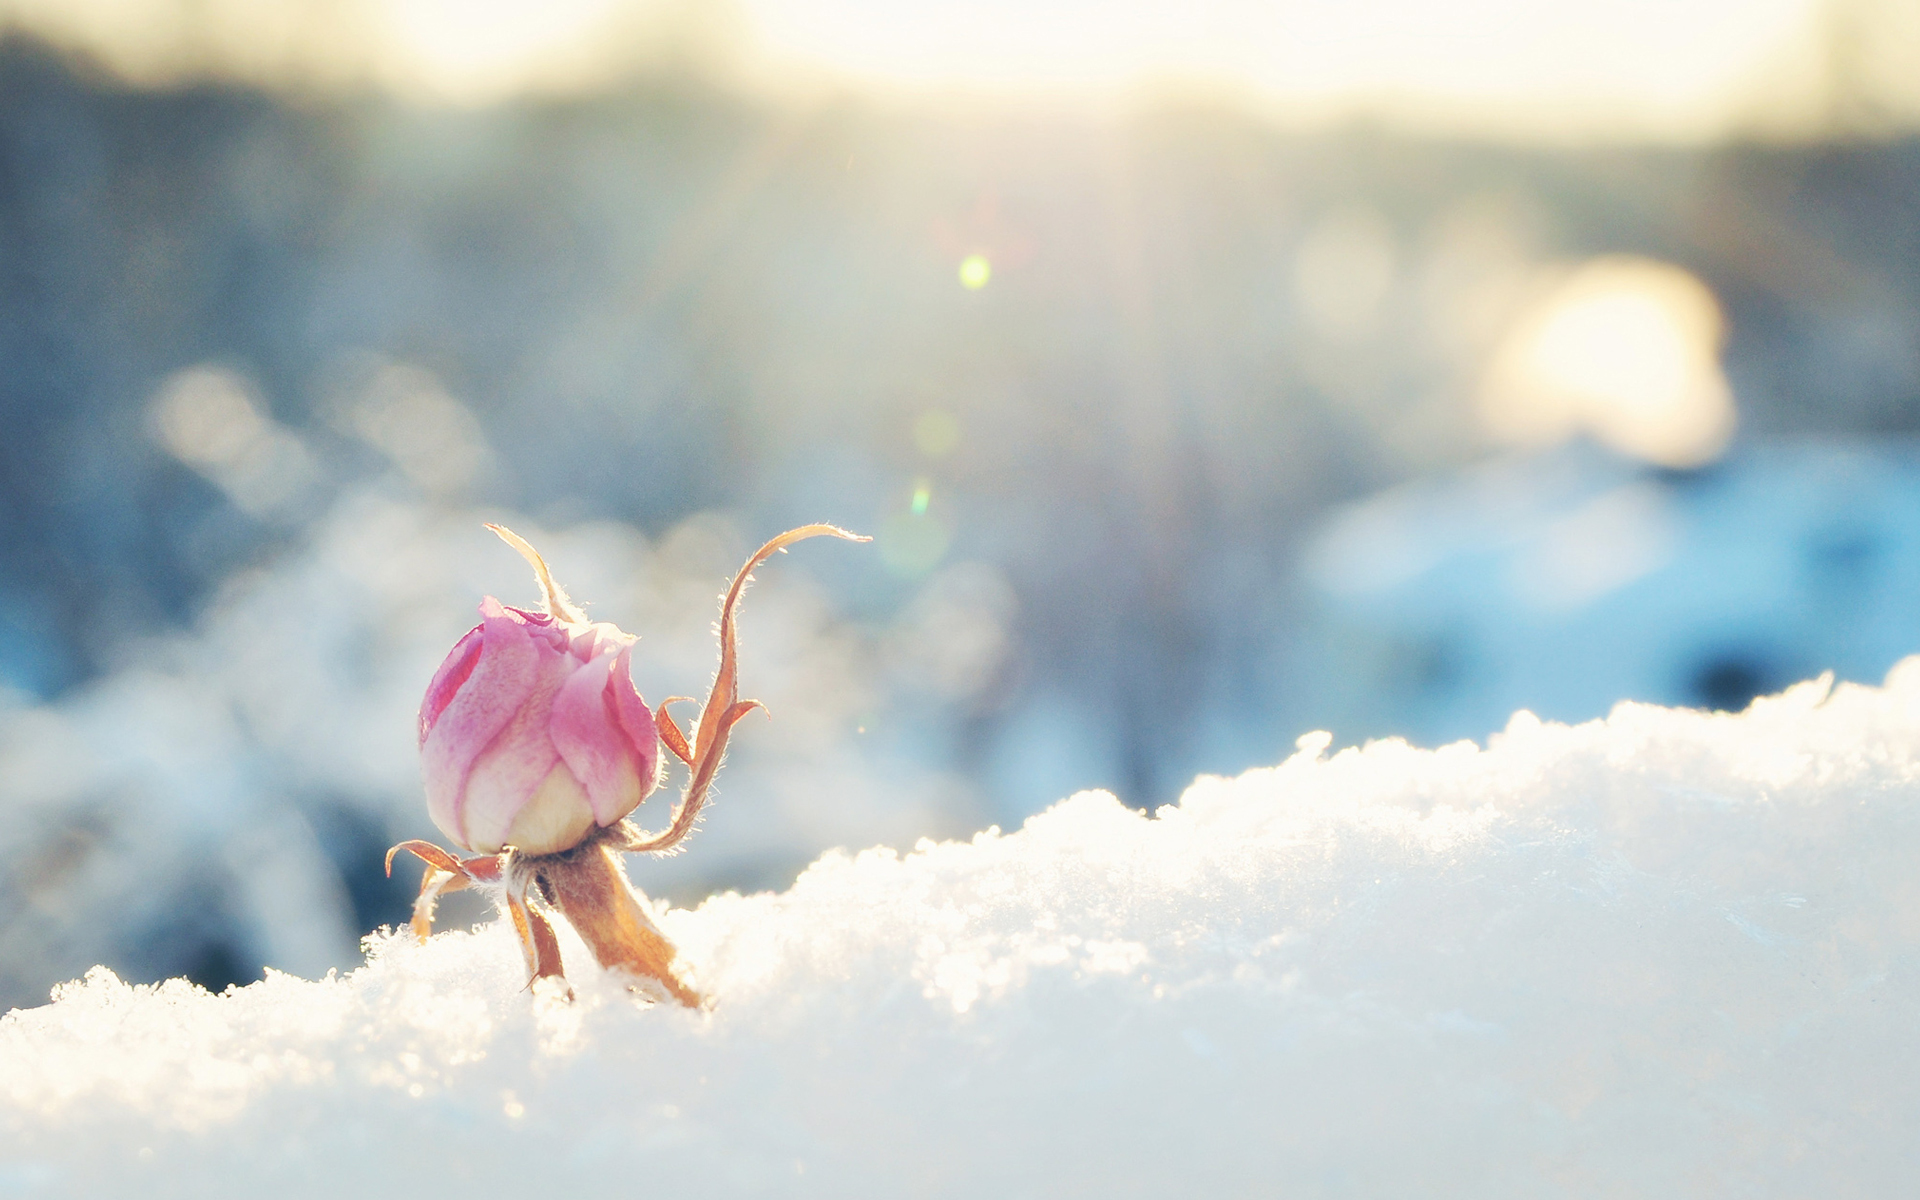 Flower rose bud snow sunny pink bokeh winter d wallpaper